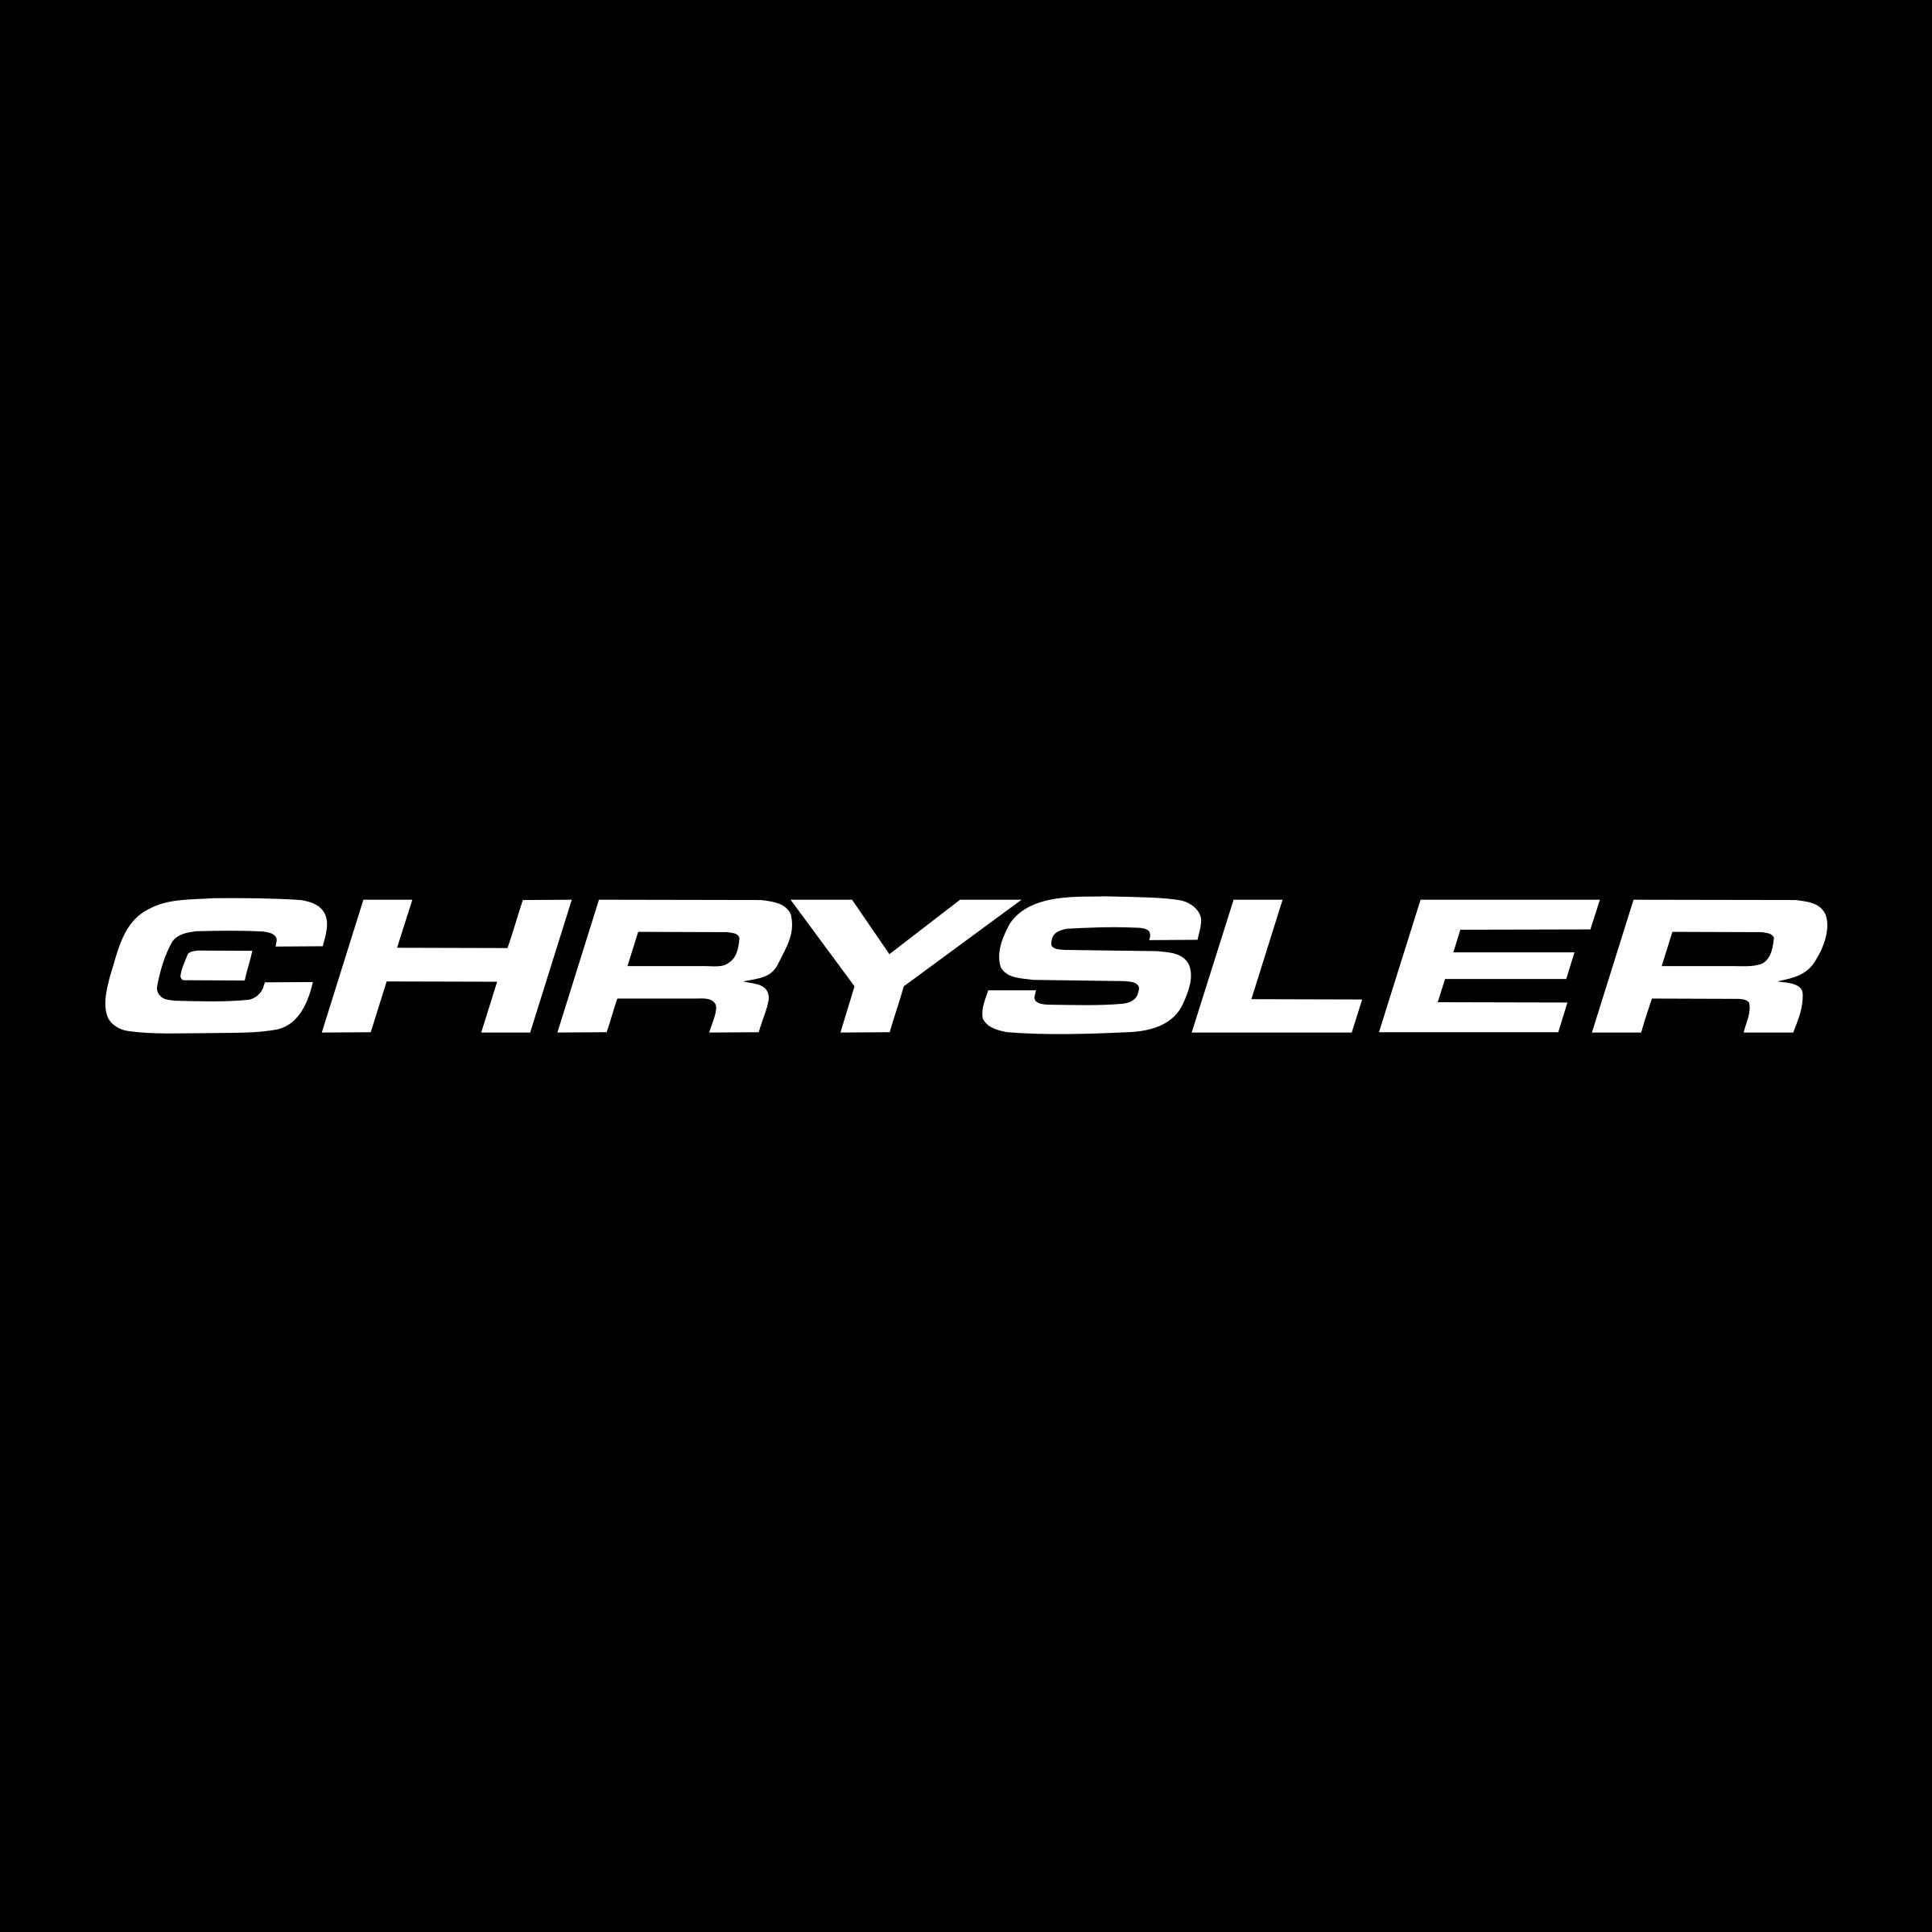 chrysler logo png transparent svg vector freebie supply rh freebiesupply com chrysler emblem vector fiat chrysler automobiles logo vector